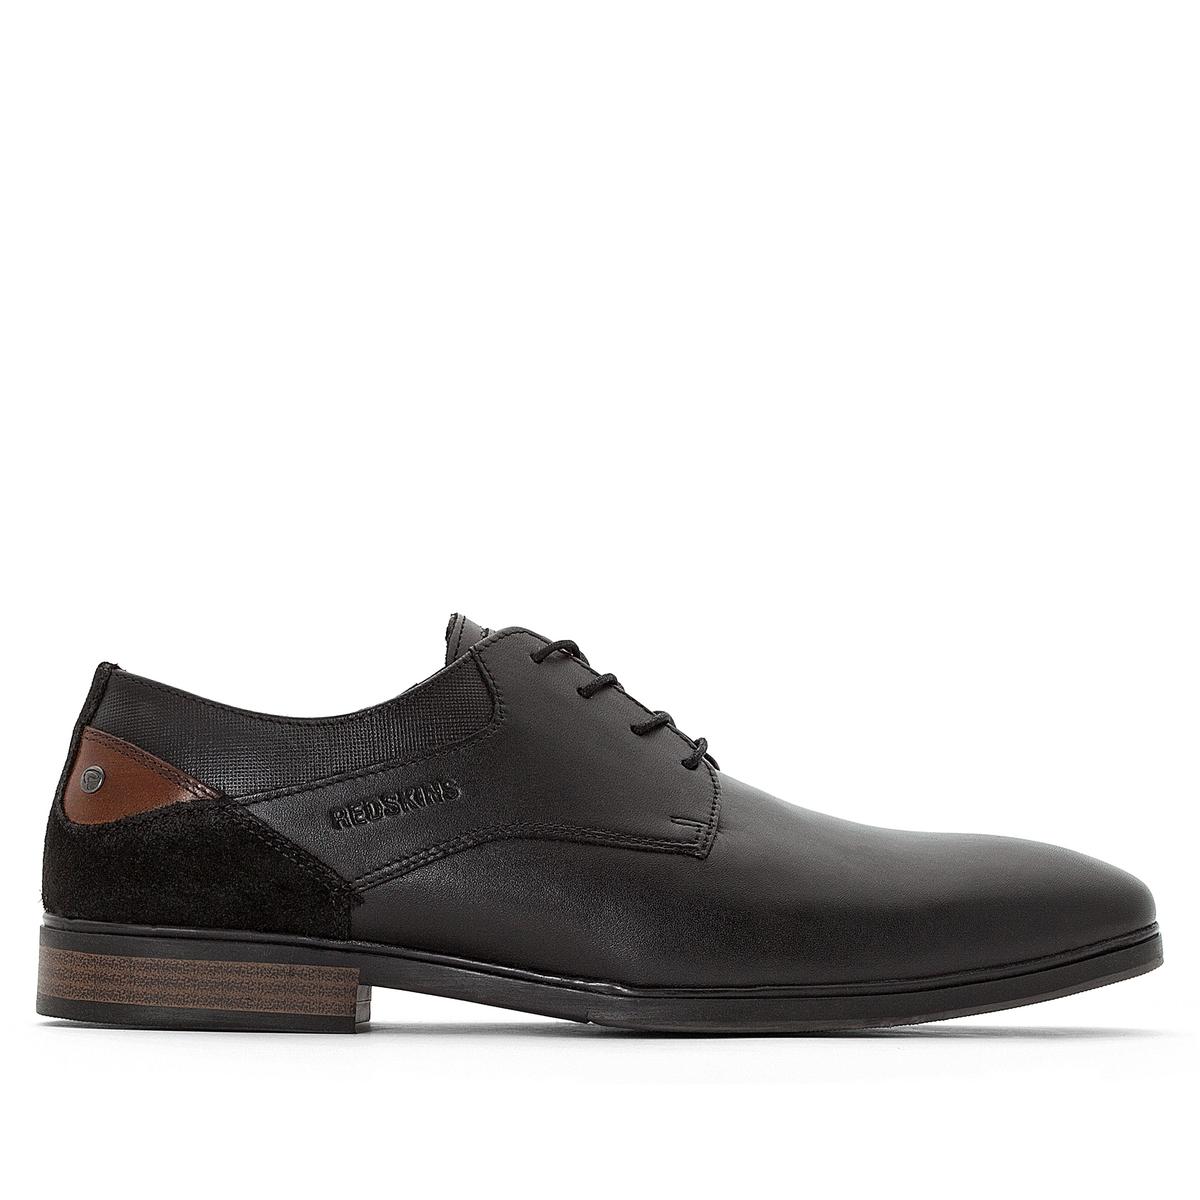 Ботинки-дерби из кожи Lafont ботинки дерби из мягкой кожи takarika